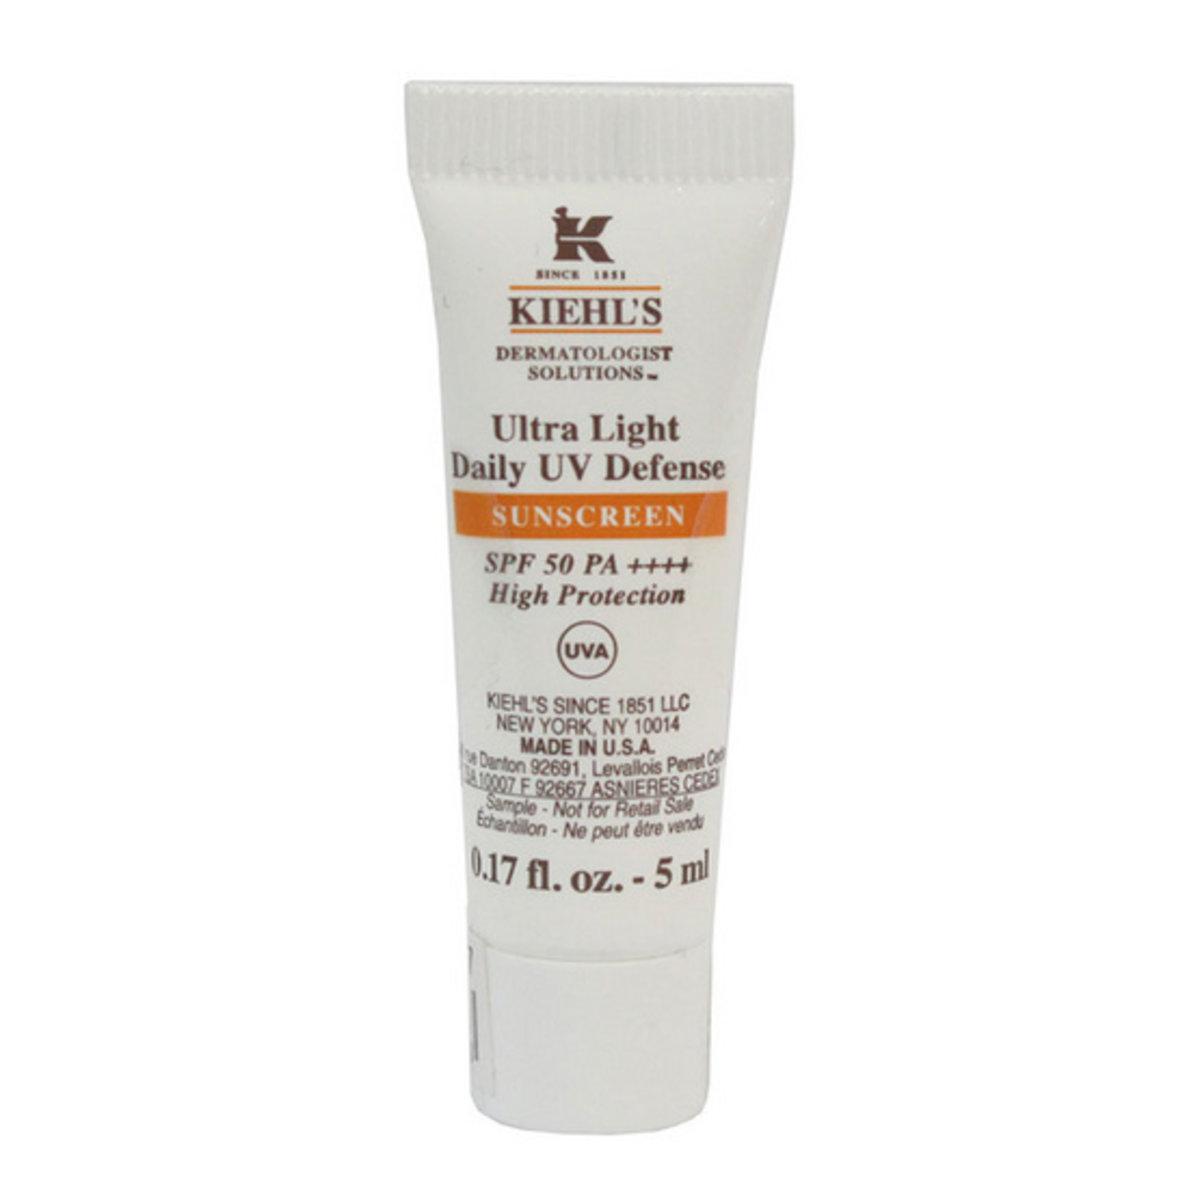 Kiehl's - Ultra Light Daily UV Defense SPF 50 PA+++ UVA 5ml ( Tube ) [Parallel Import]